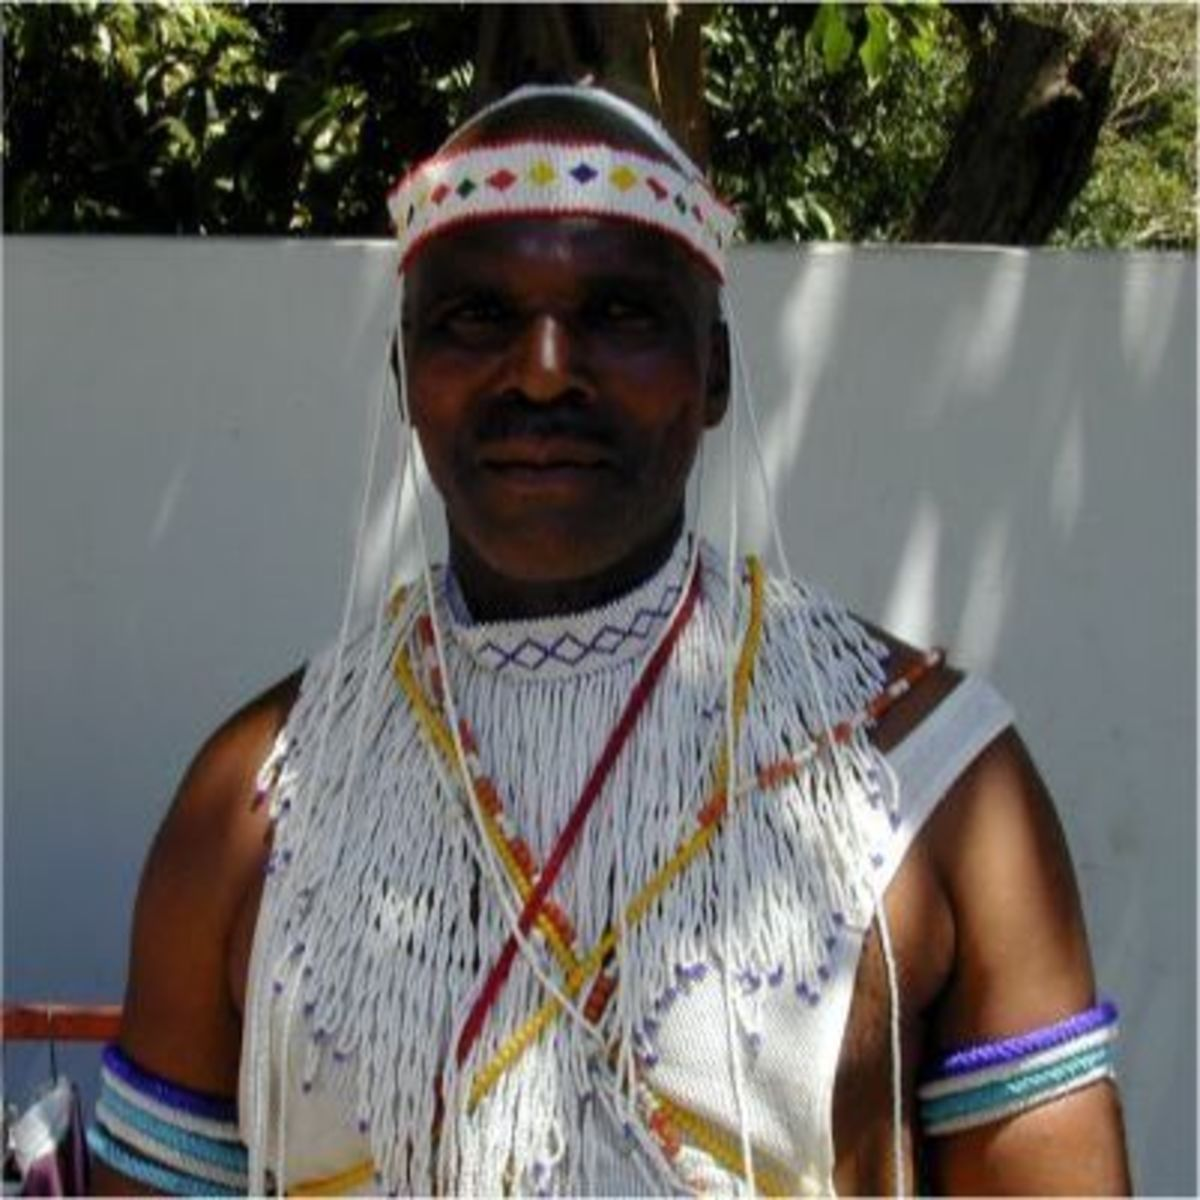 A xhosa man clad in clan garb